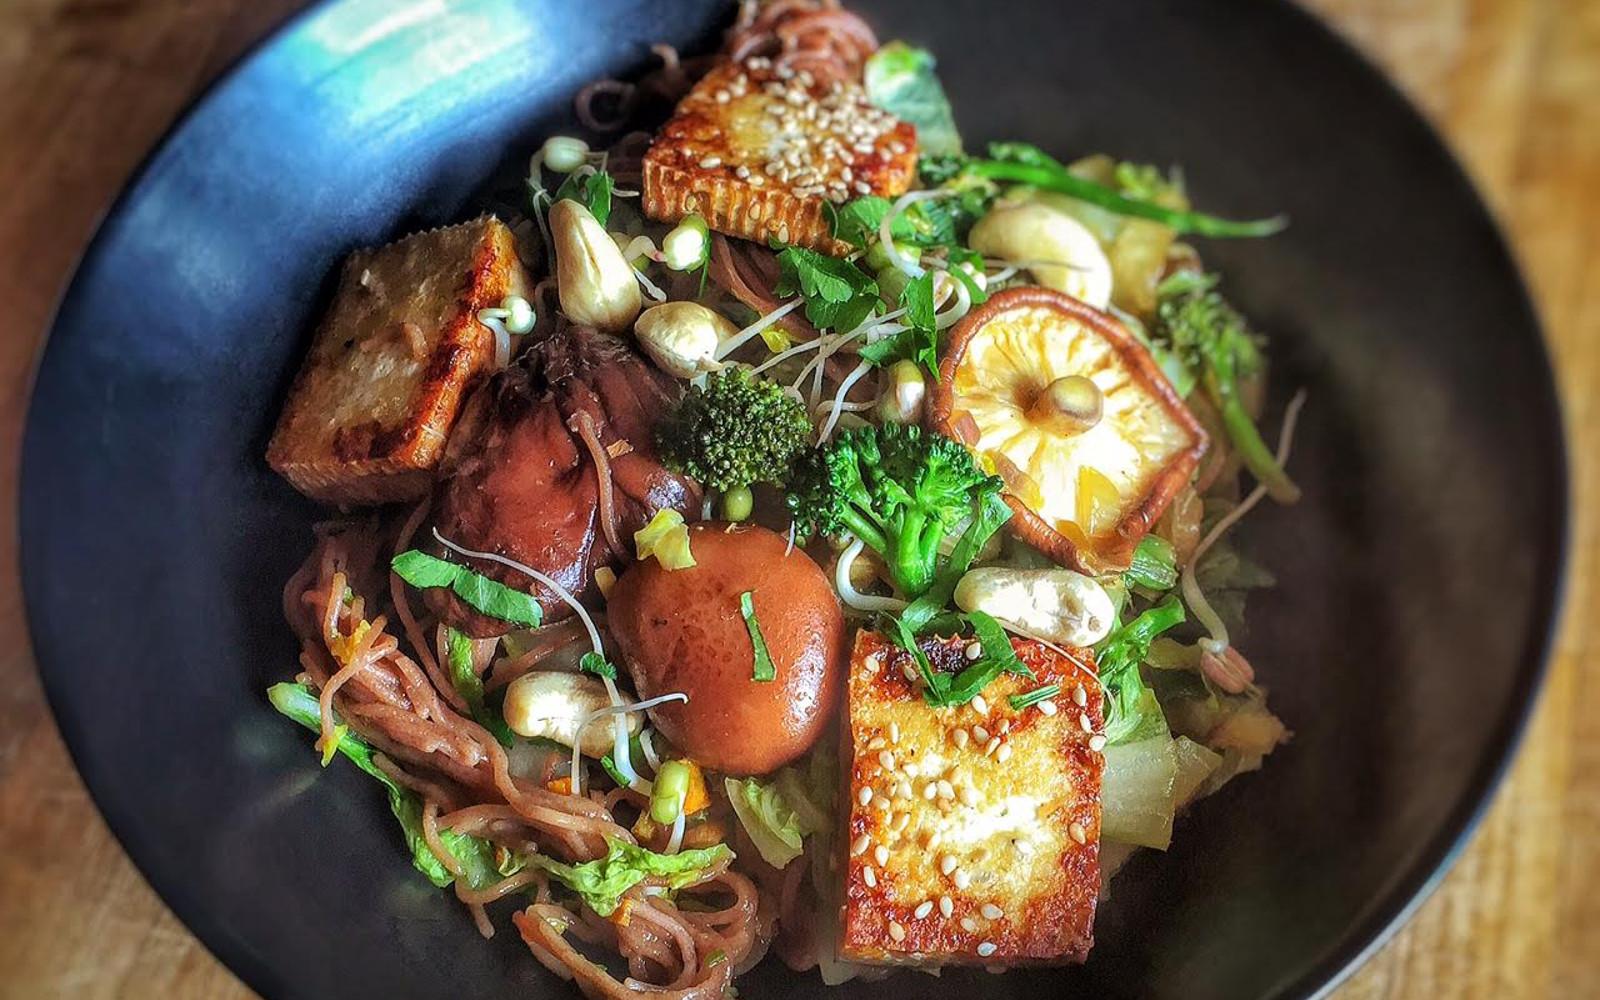 Savory Shiitake, Tofu, and Cabbage Stir-Fry